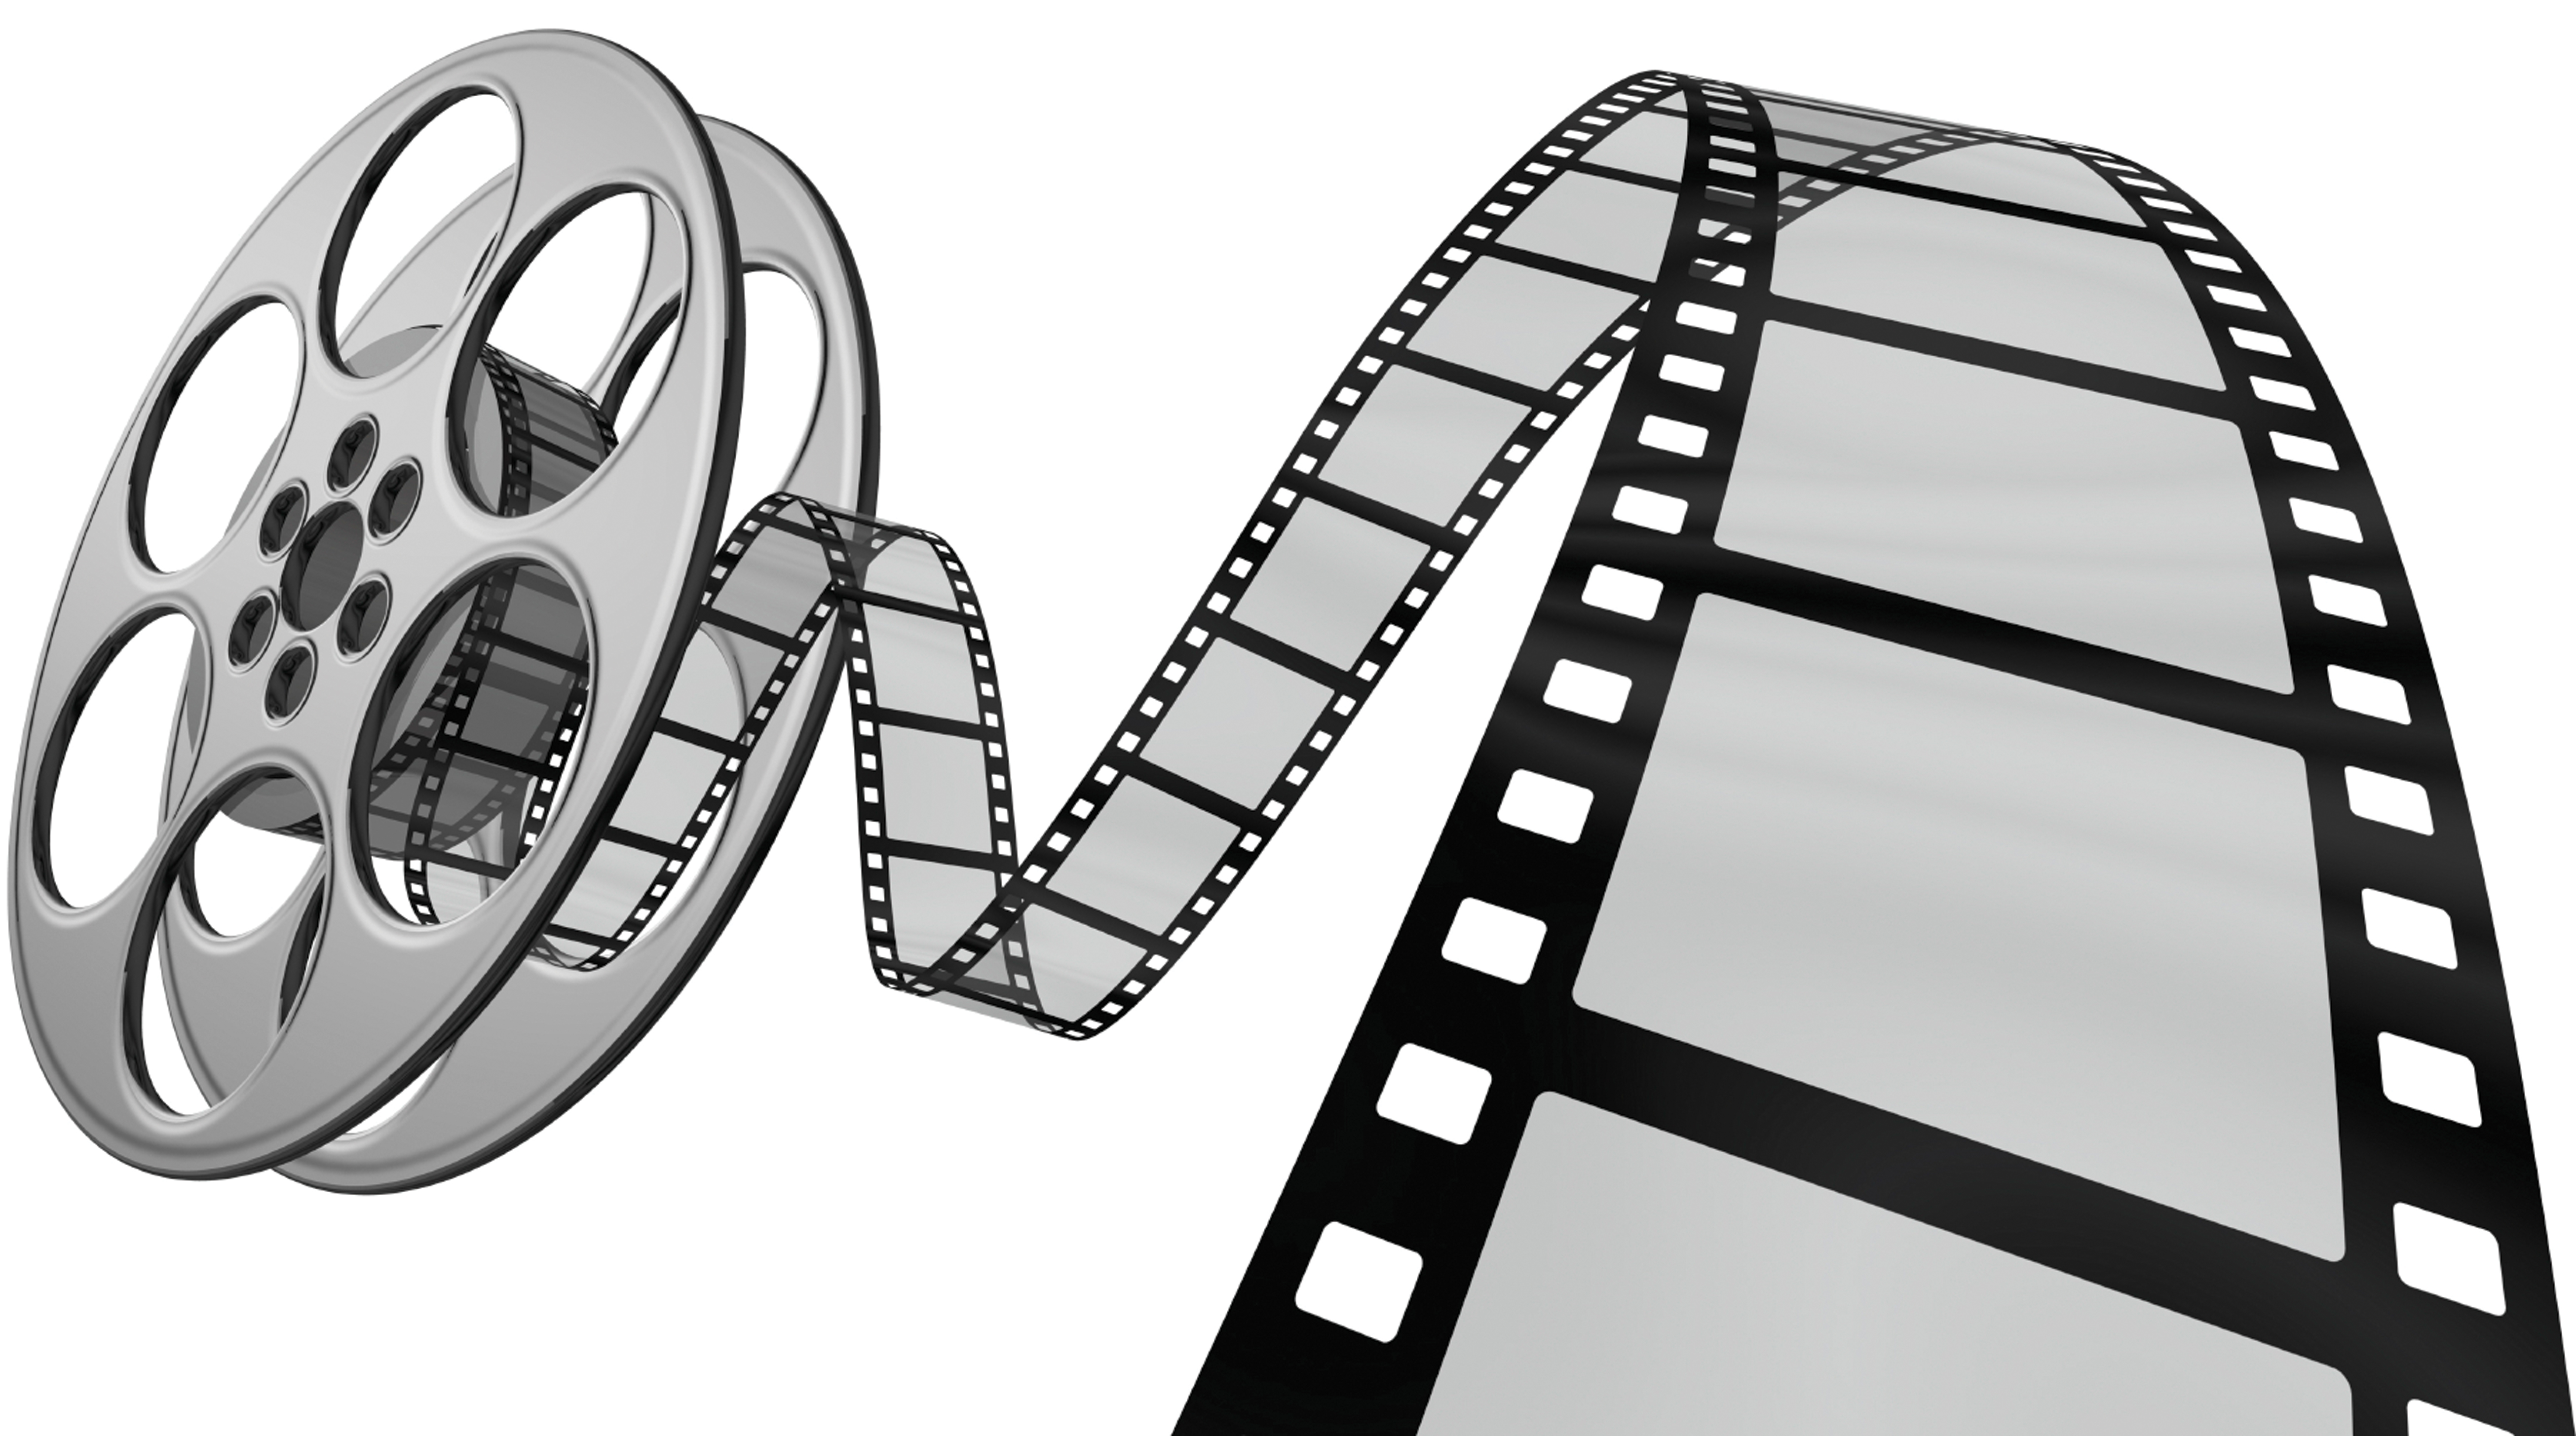 Film Clipart. 89155400227e04d165f049379b94e7 ... 89155400227e04d165f049379b94e7 ... Clipartbest Com